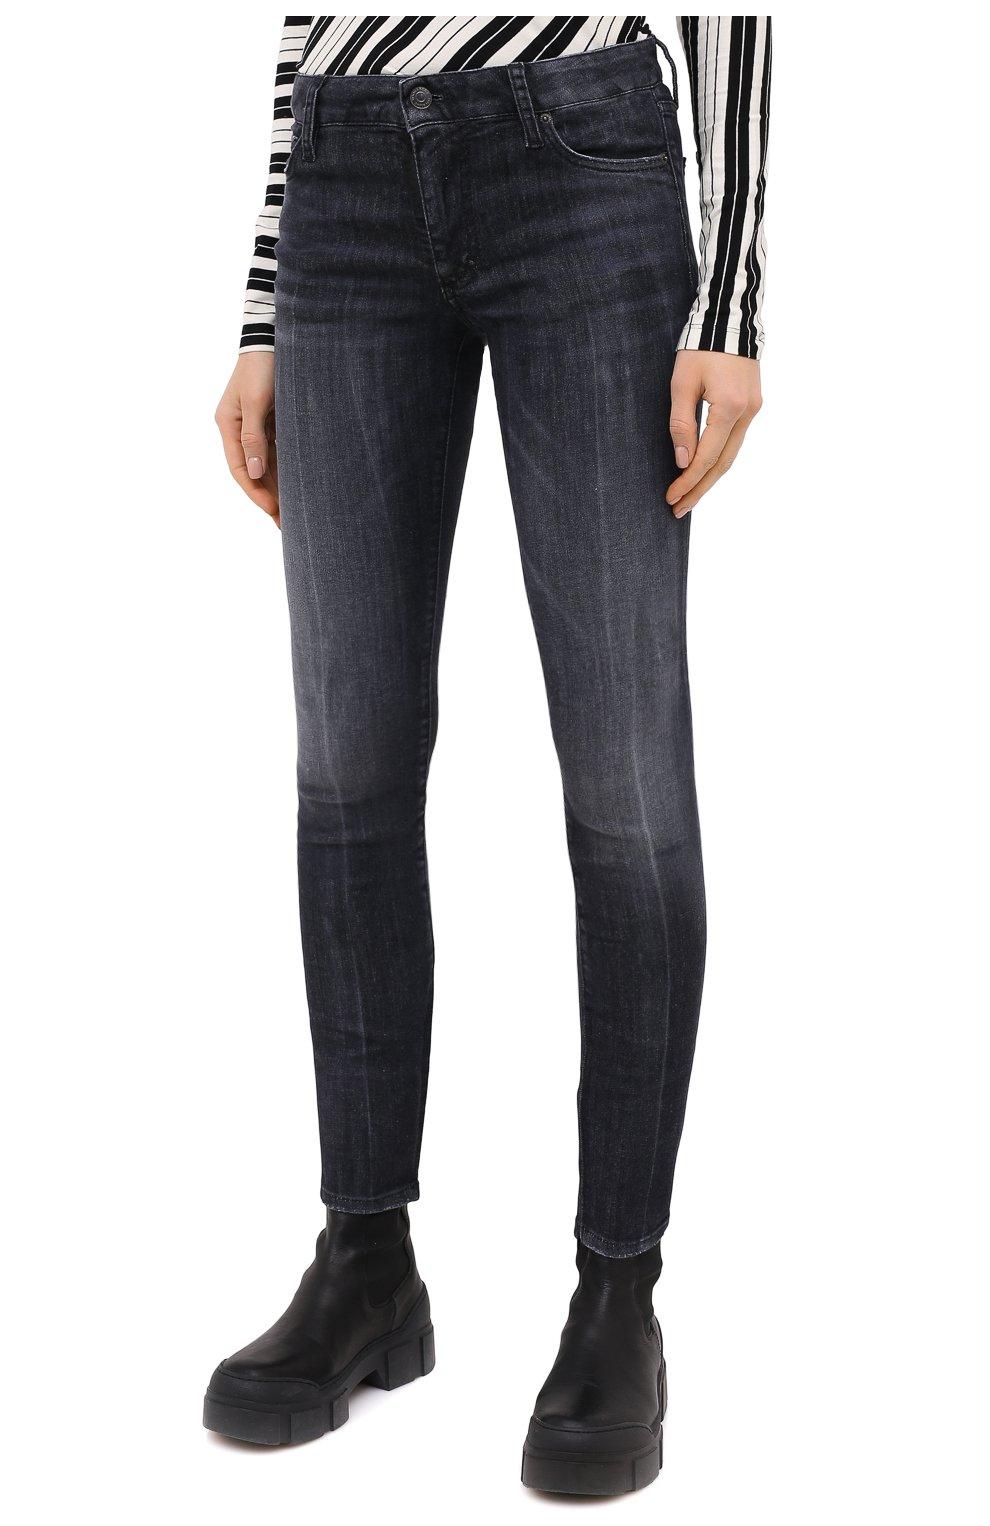 Женские джинсы DSQUARED2 черного цвета, арт. S75LB0381/S30503 | Фото 3